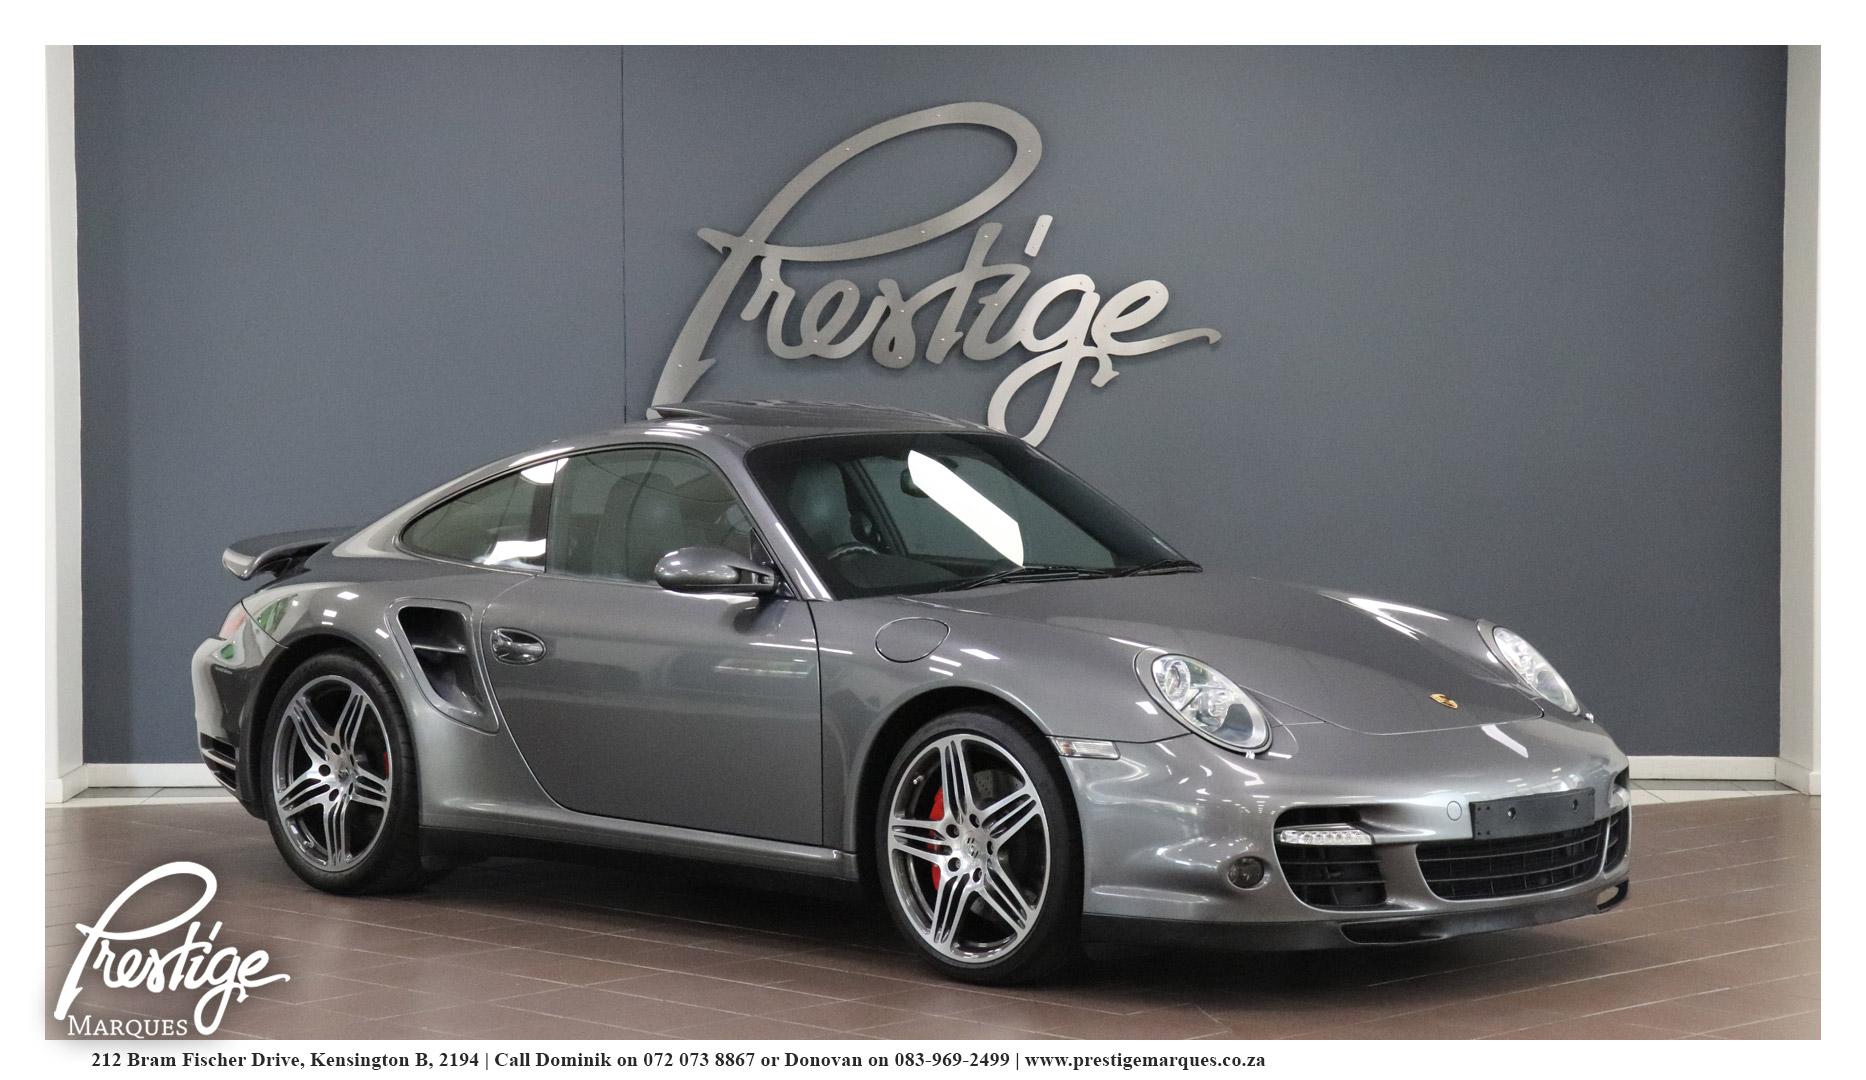 2008-Porsche-911-997-Turbo-Tiptronic-Prestige-Marques-Randburg-Sandton-1